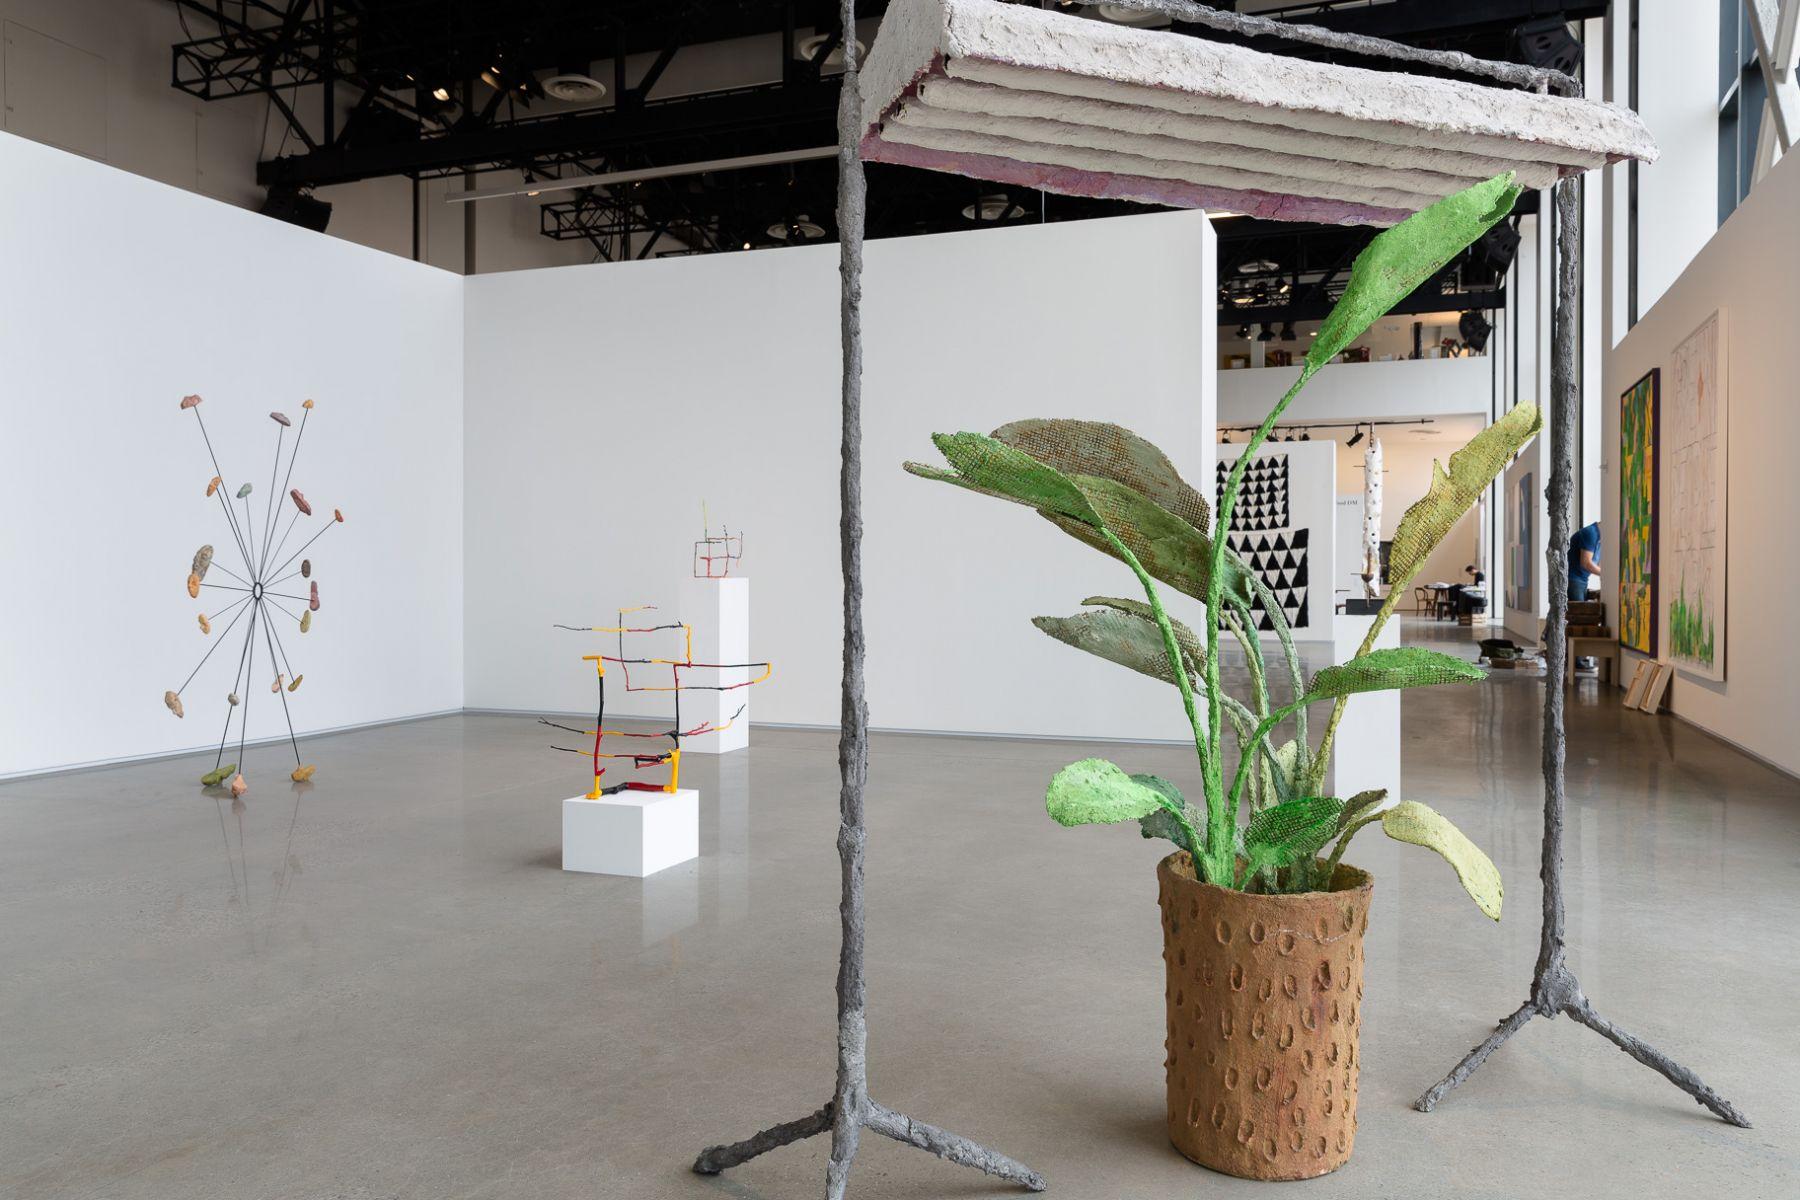 Evan Holloway Exhibition View David Kordansky Gallery, Independent New York 2016.